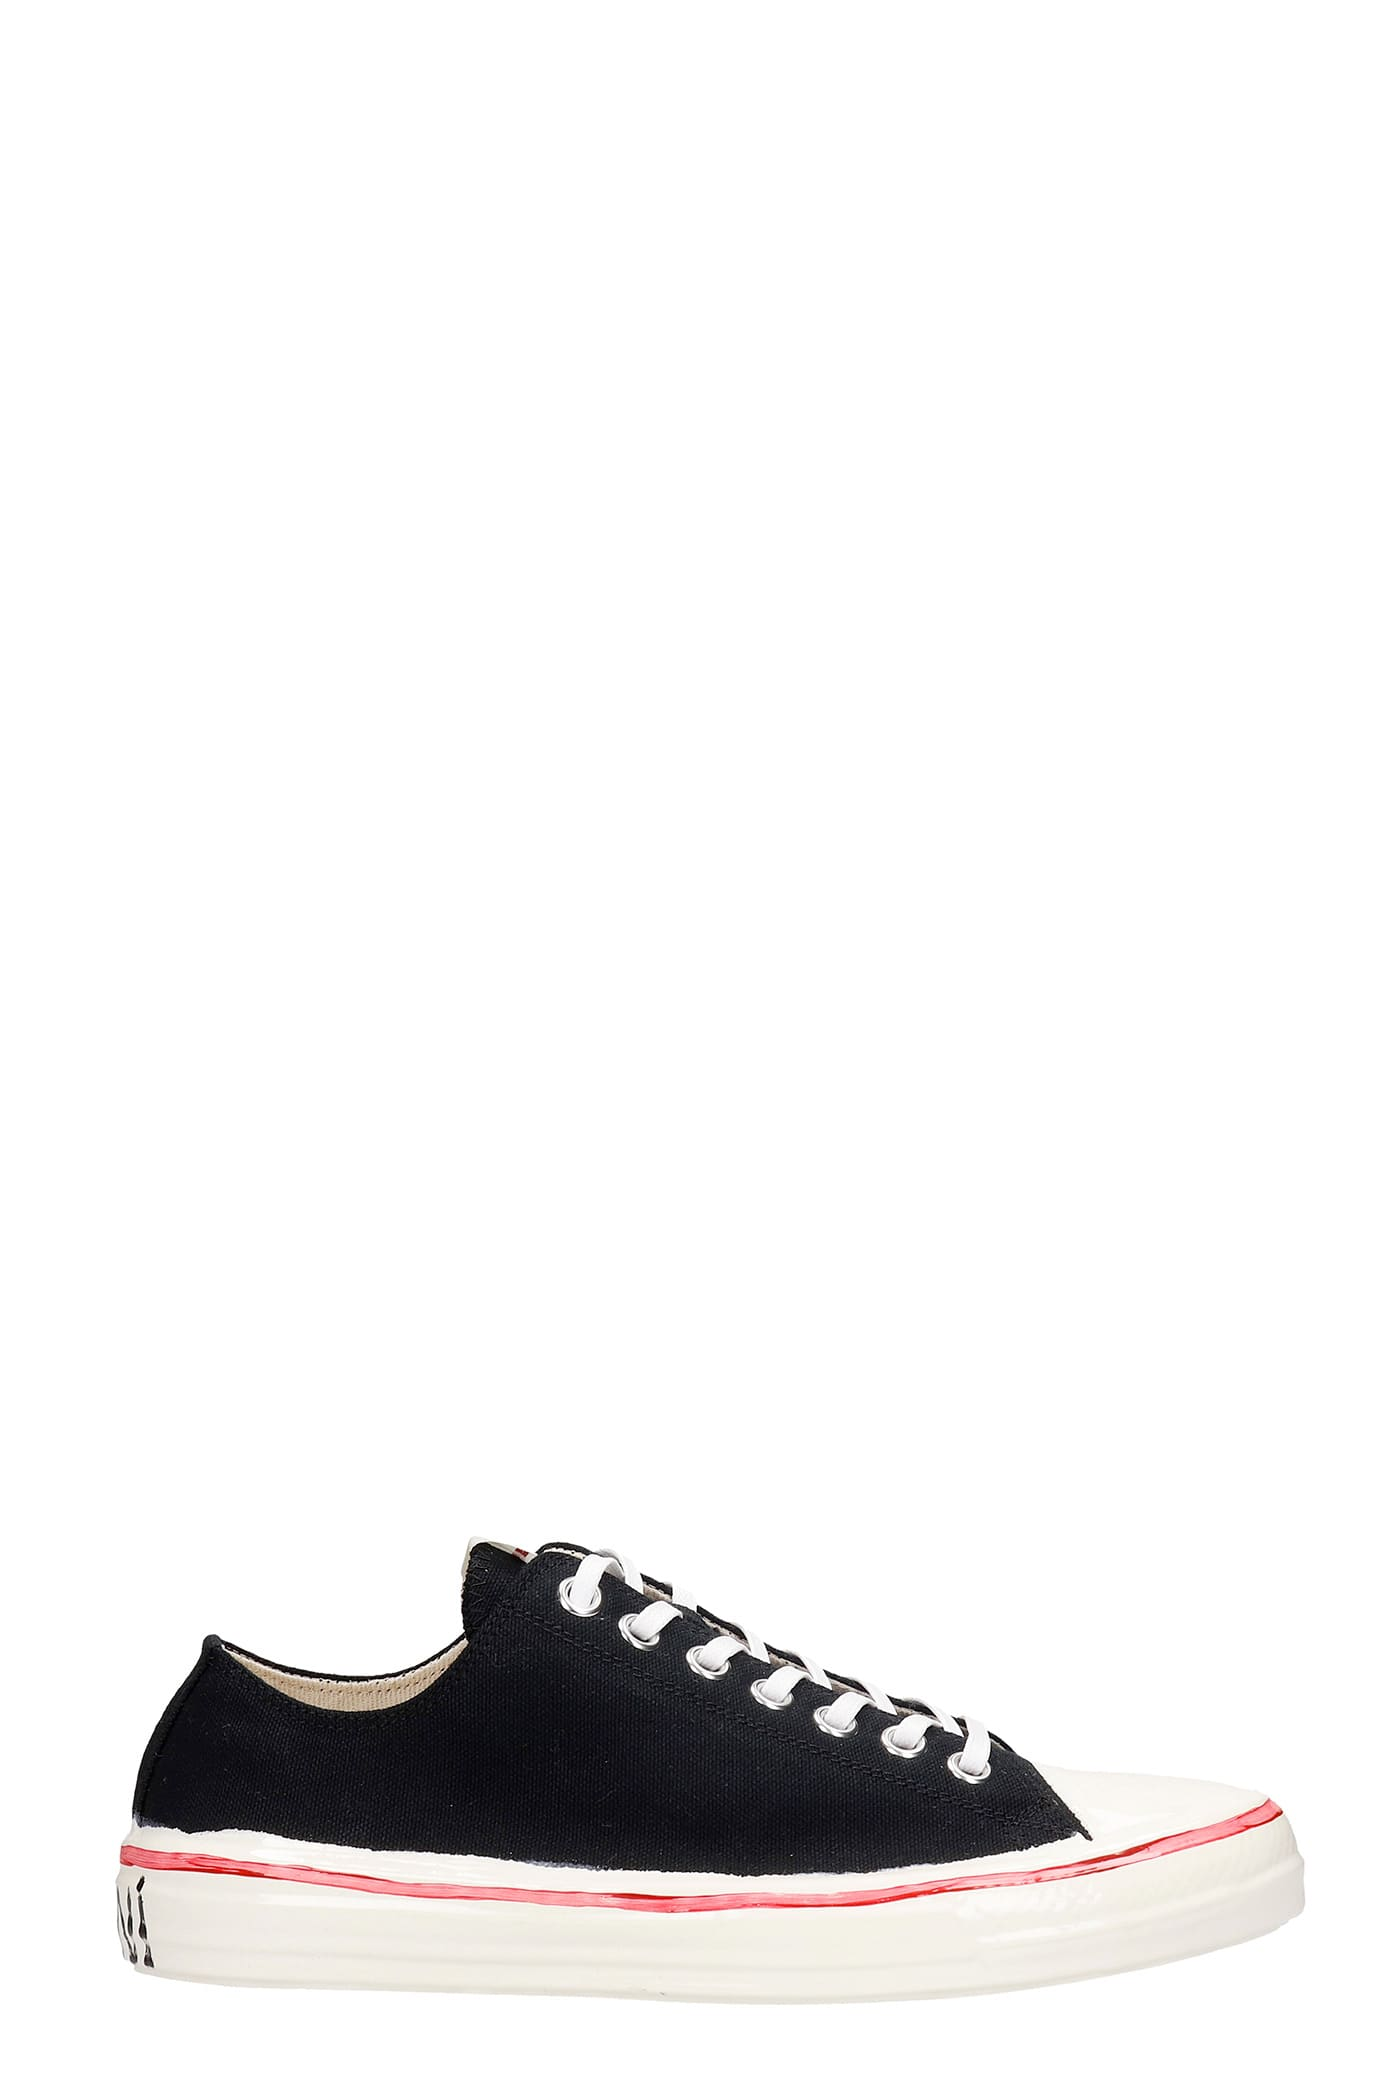 Marni Gooey Sneakers In Black Canvas